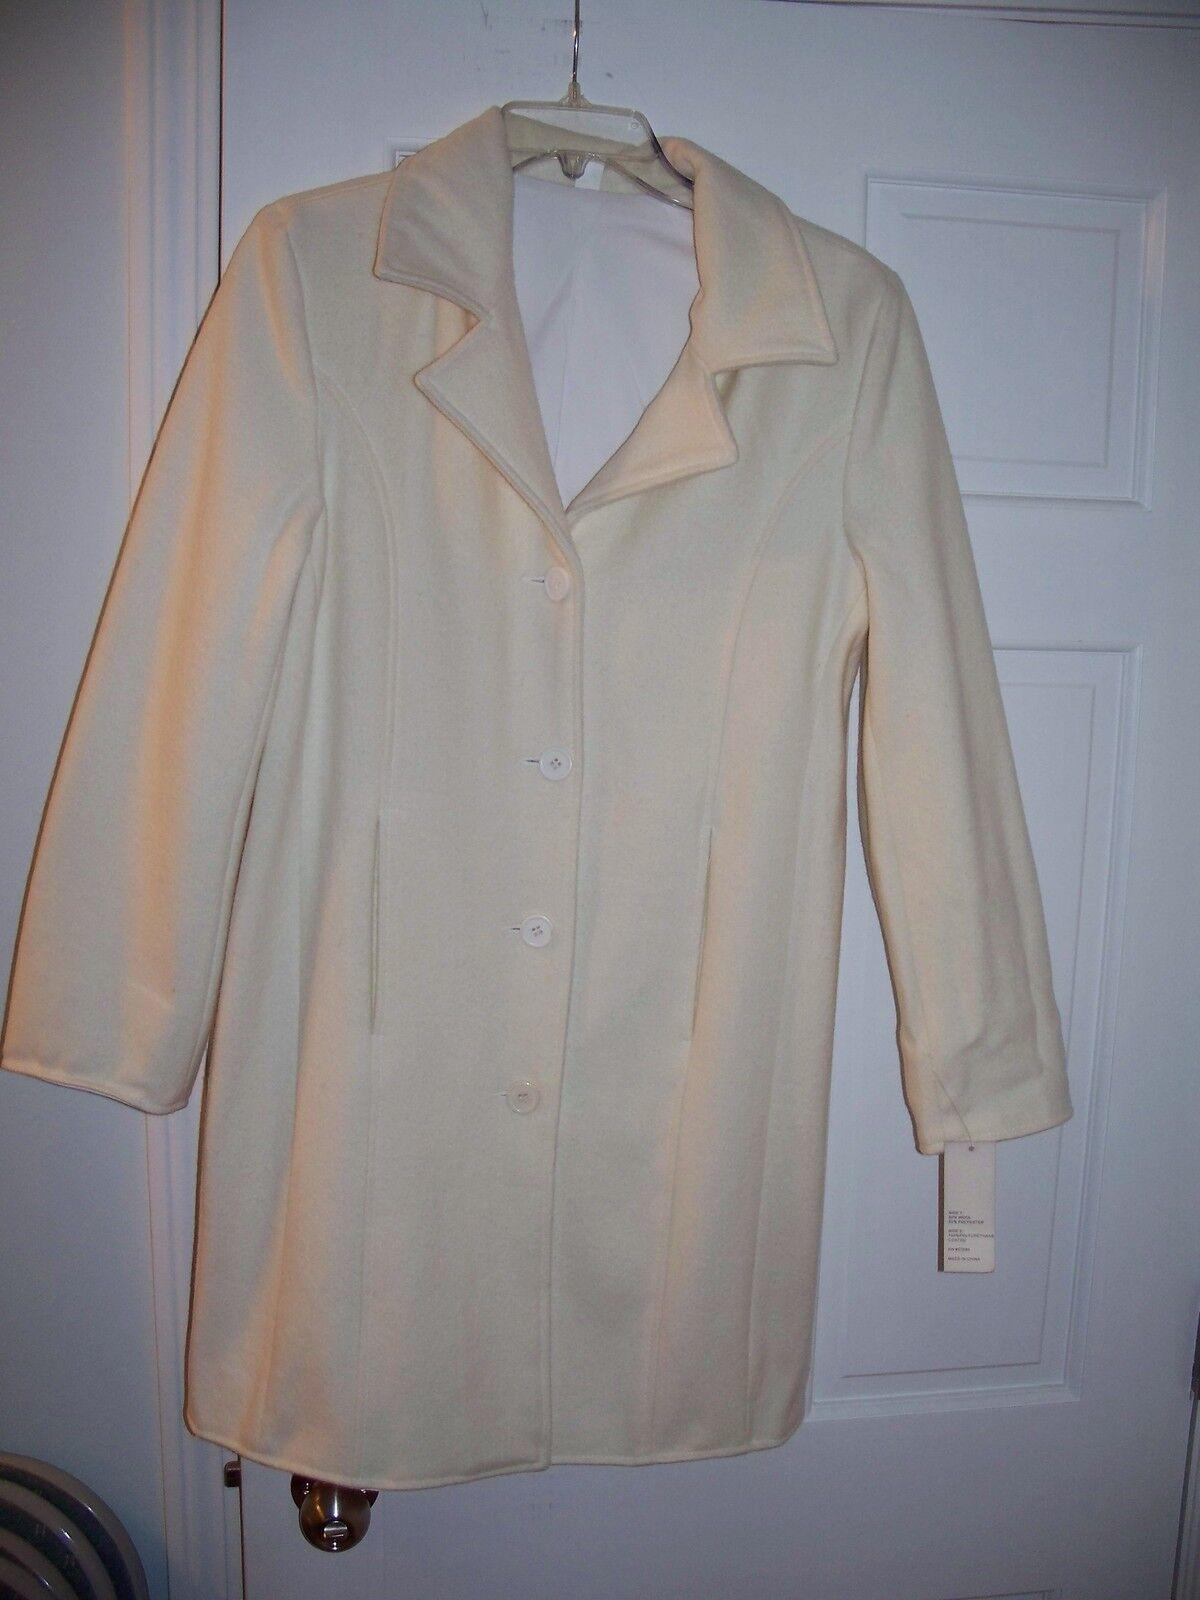 NWT Women's Outeredge White Reversable Mid Length Dress Coat Size S